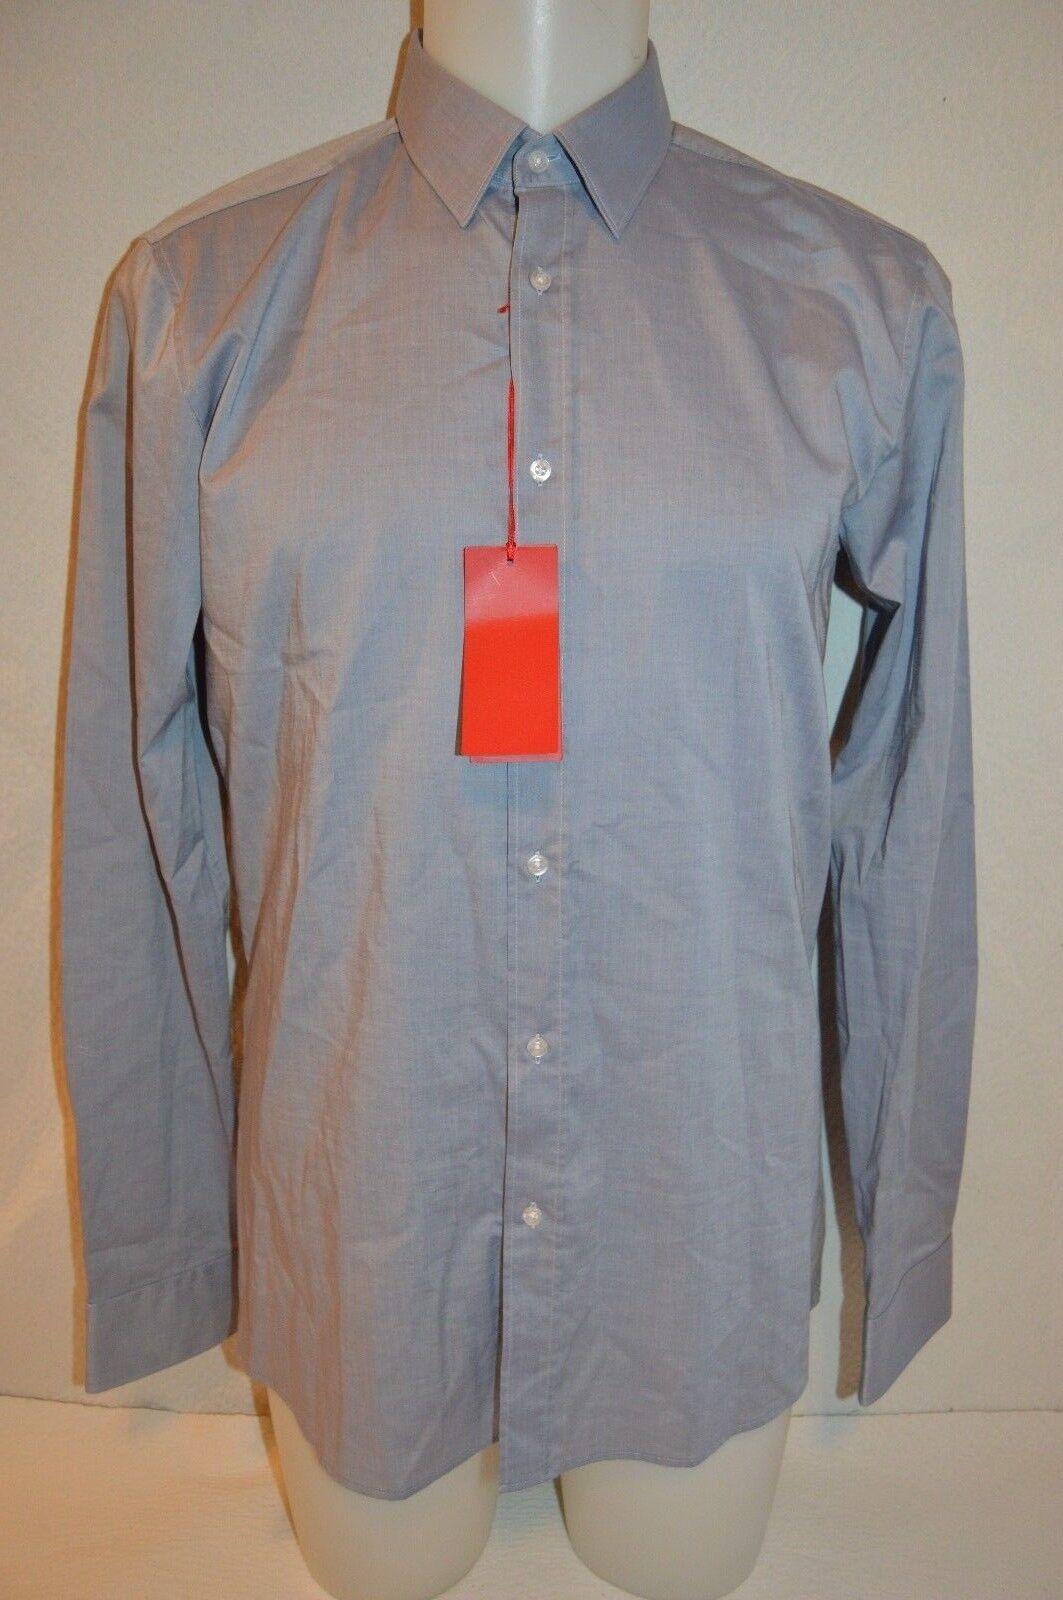 HUGO BOSS Red Label ELISHA Man's Casual Shirt  NEW Size Medium Retail